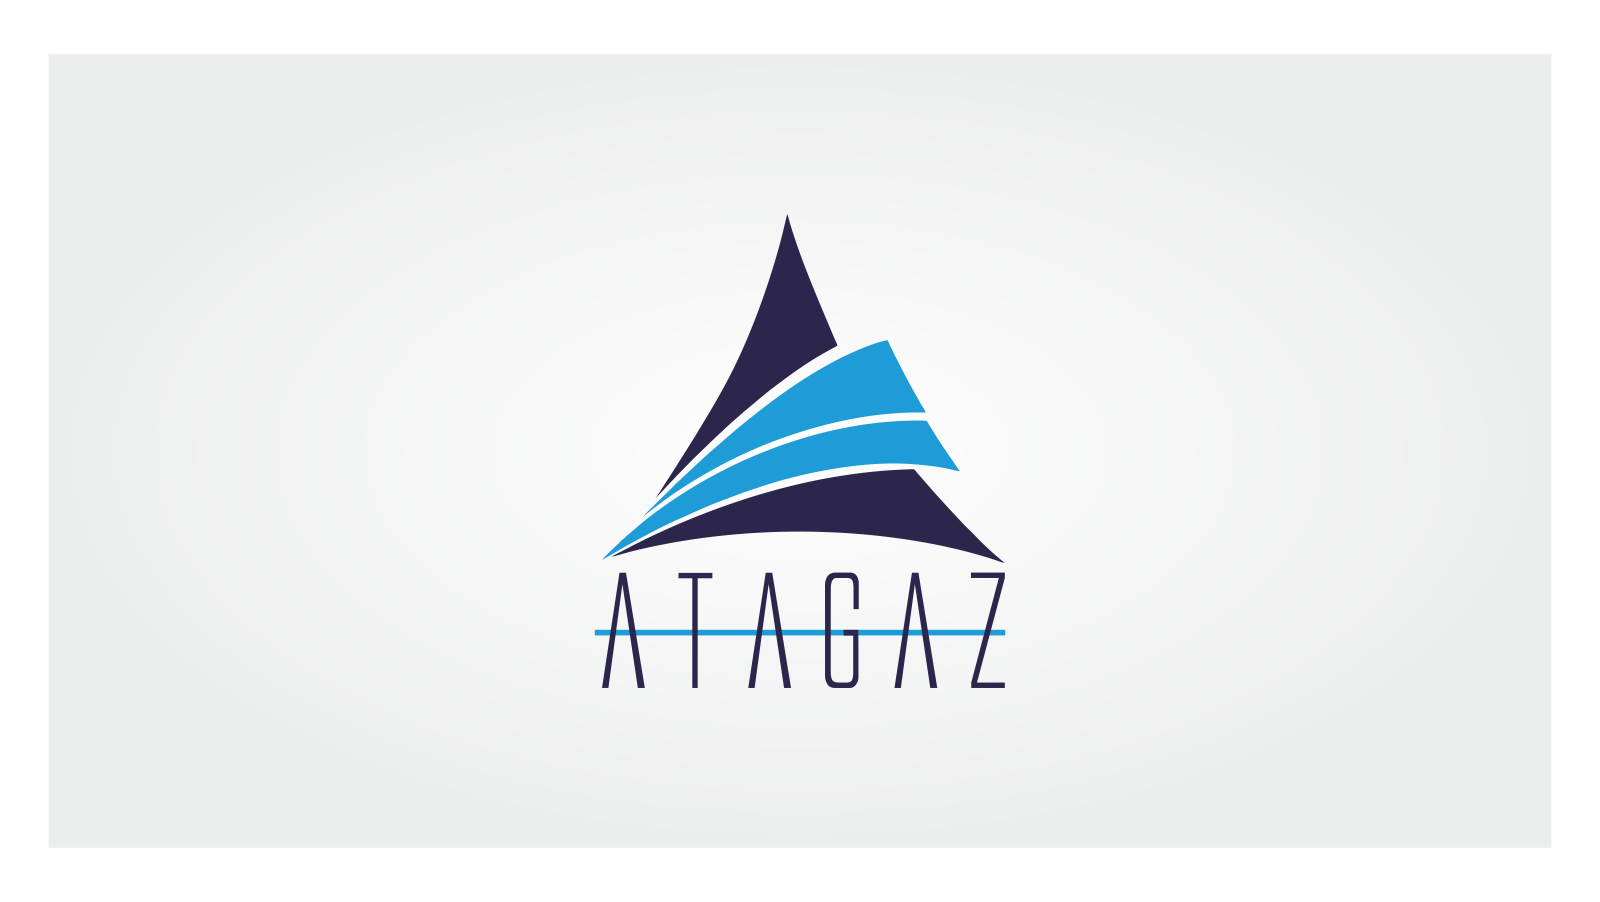 ATAGAZ